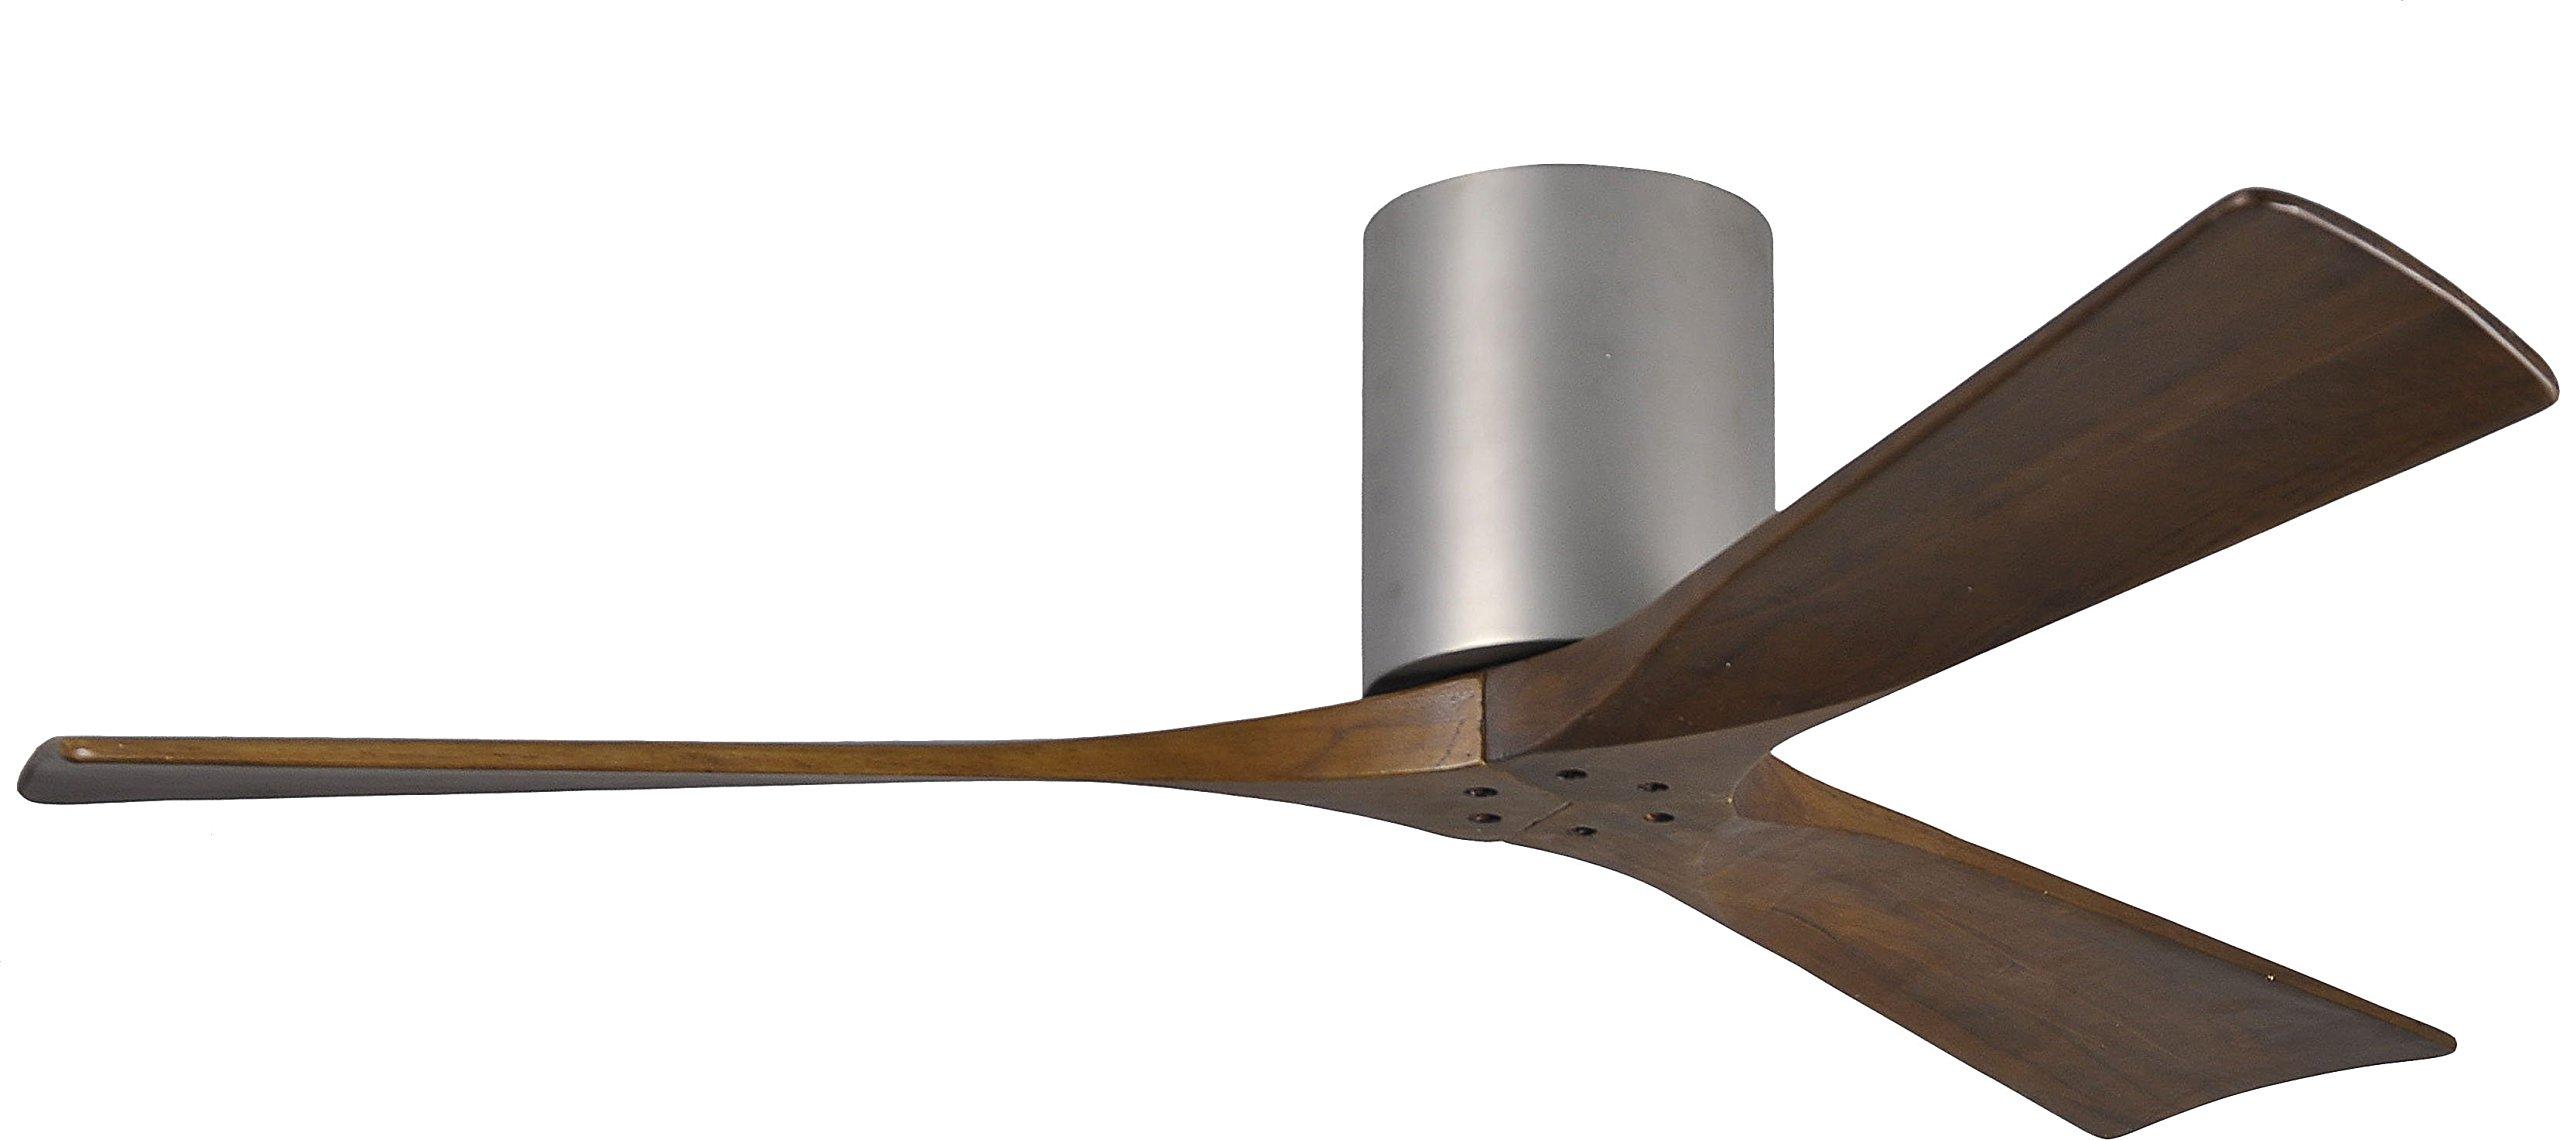 Matthews IR3H-BN-52, Irene Brushed Nickel Flush Mount 52'' Outdoor Ceiling Fan w/ Remote Ctrl